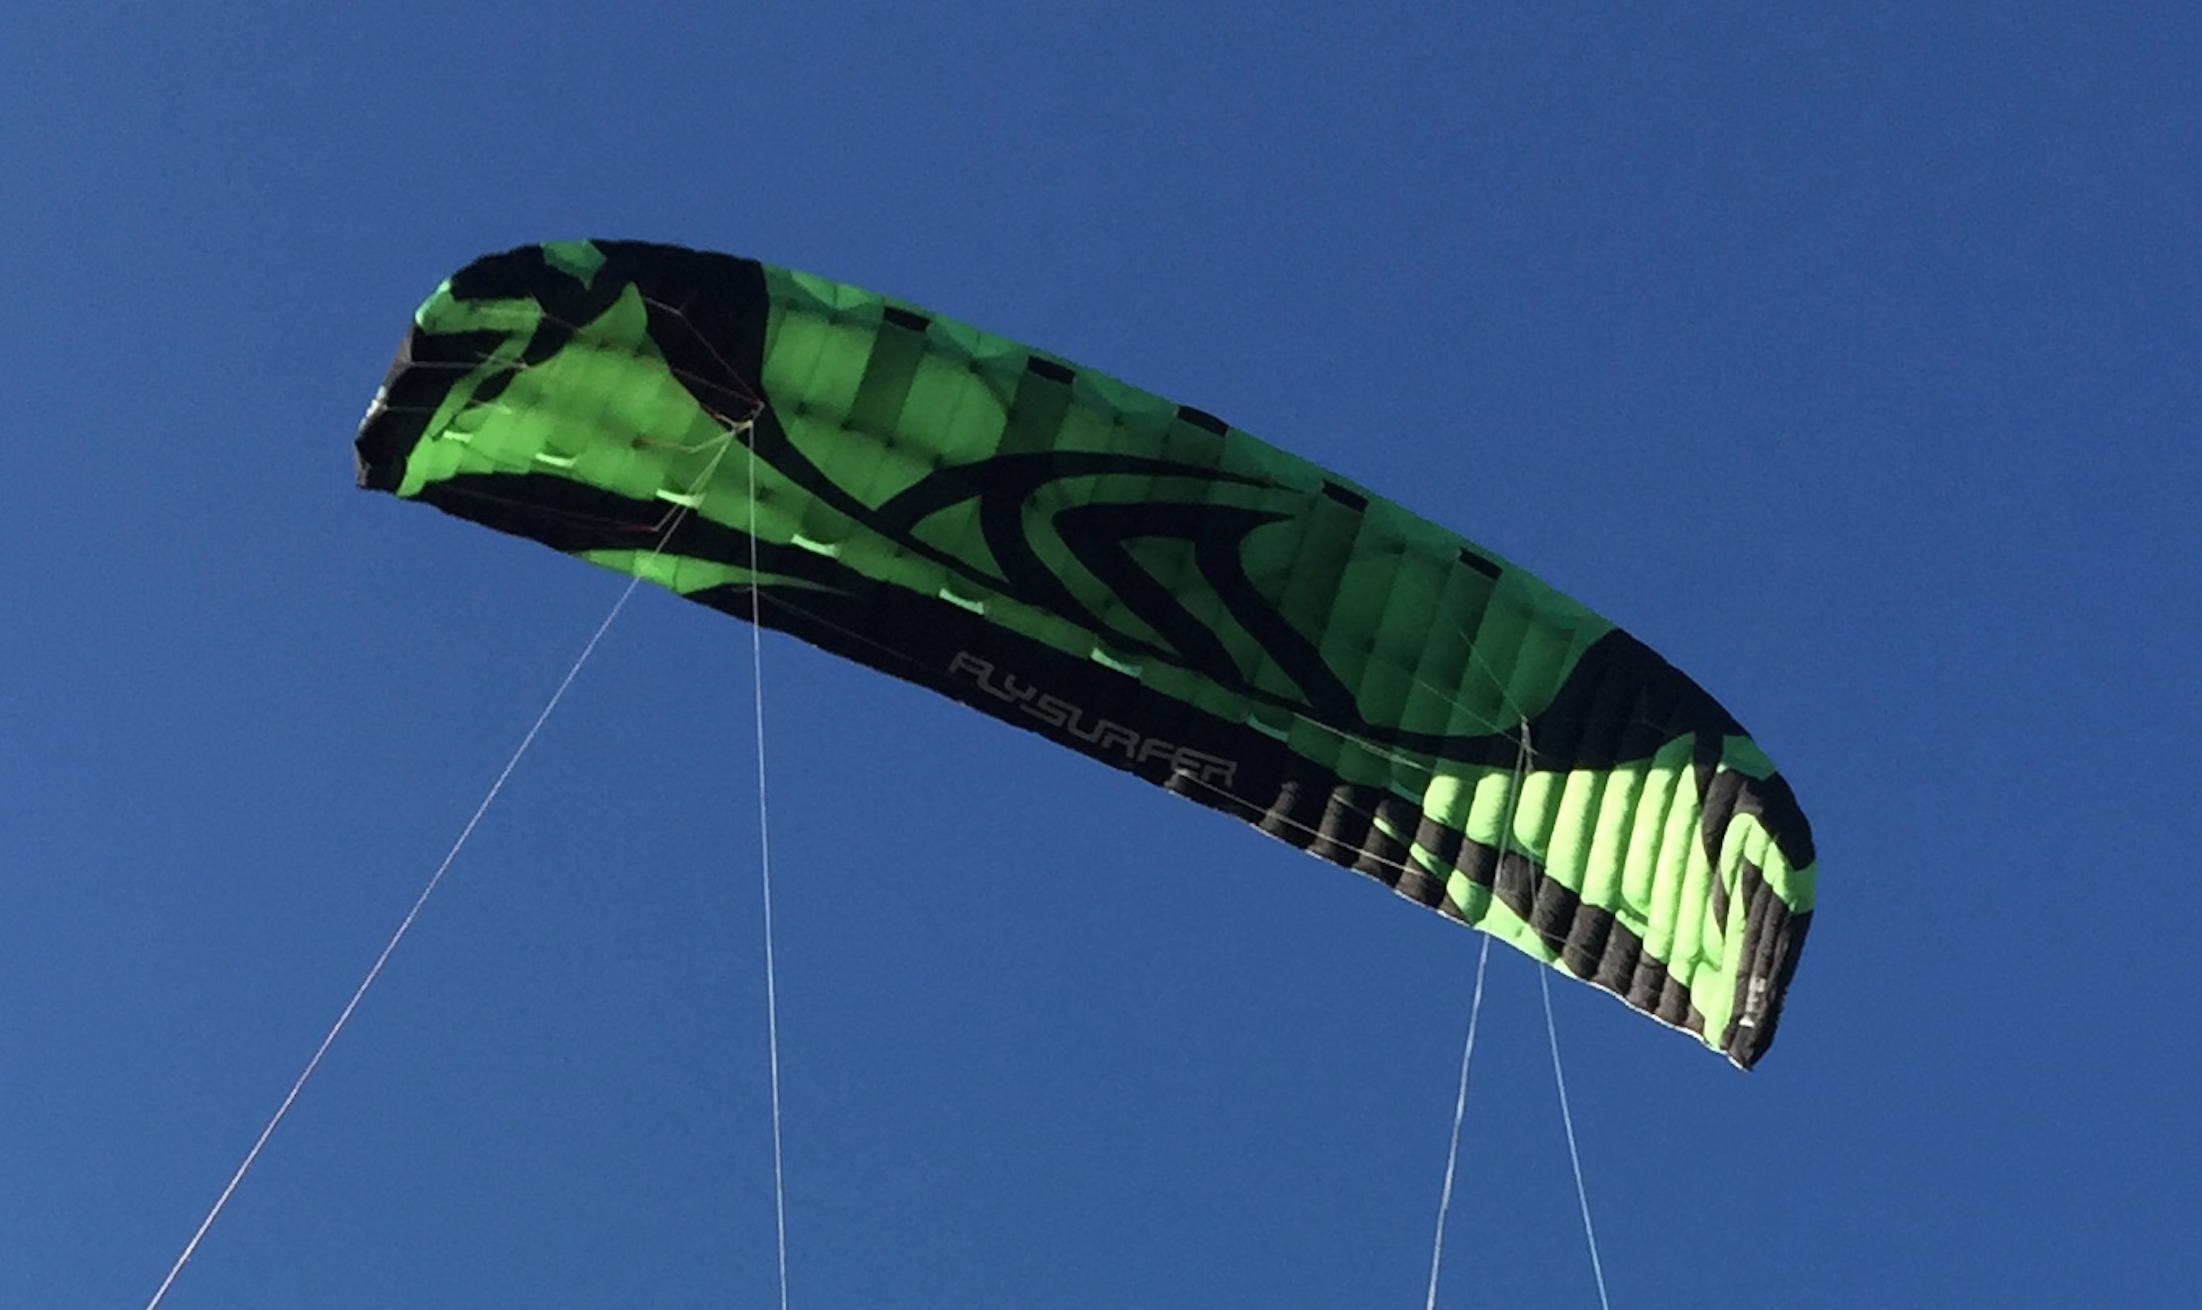 {VENDUE} Flysurfer speed3 green edition 19m2 700E XTRTZY